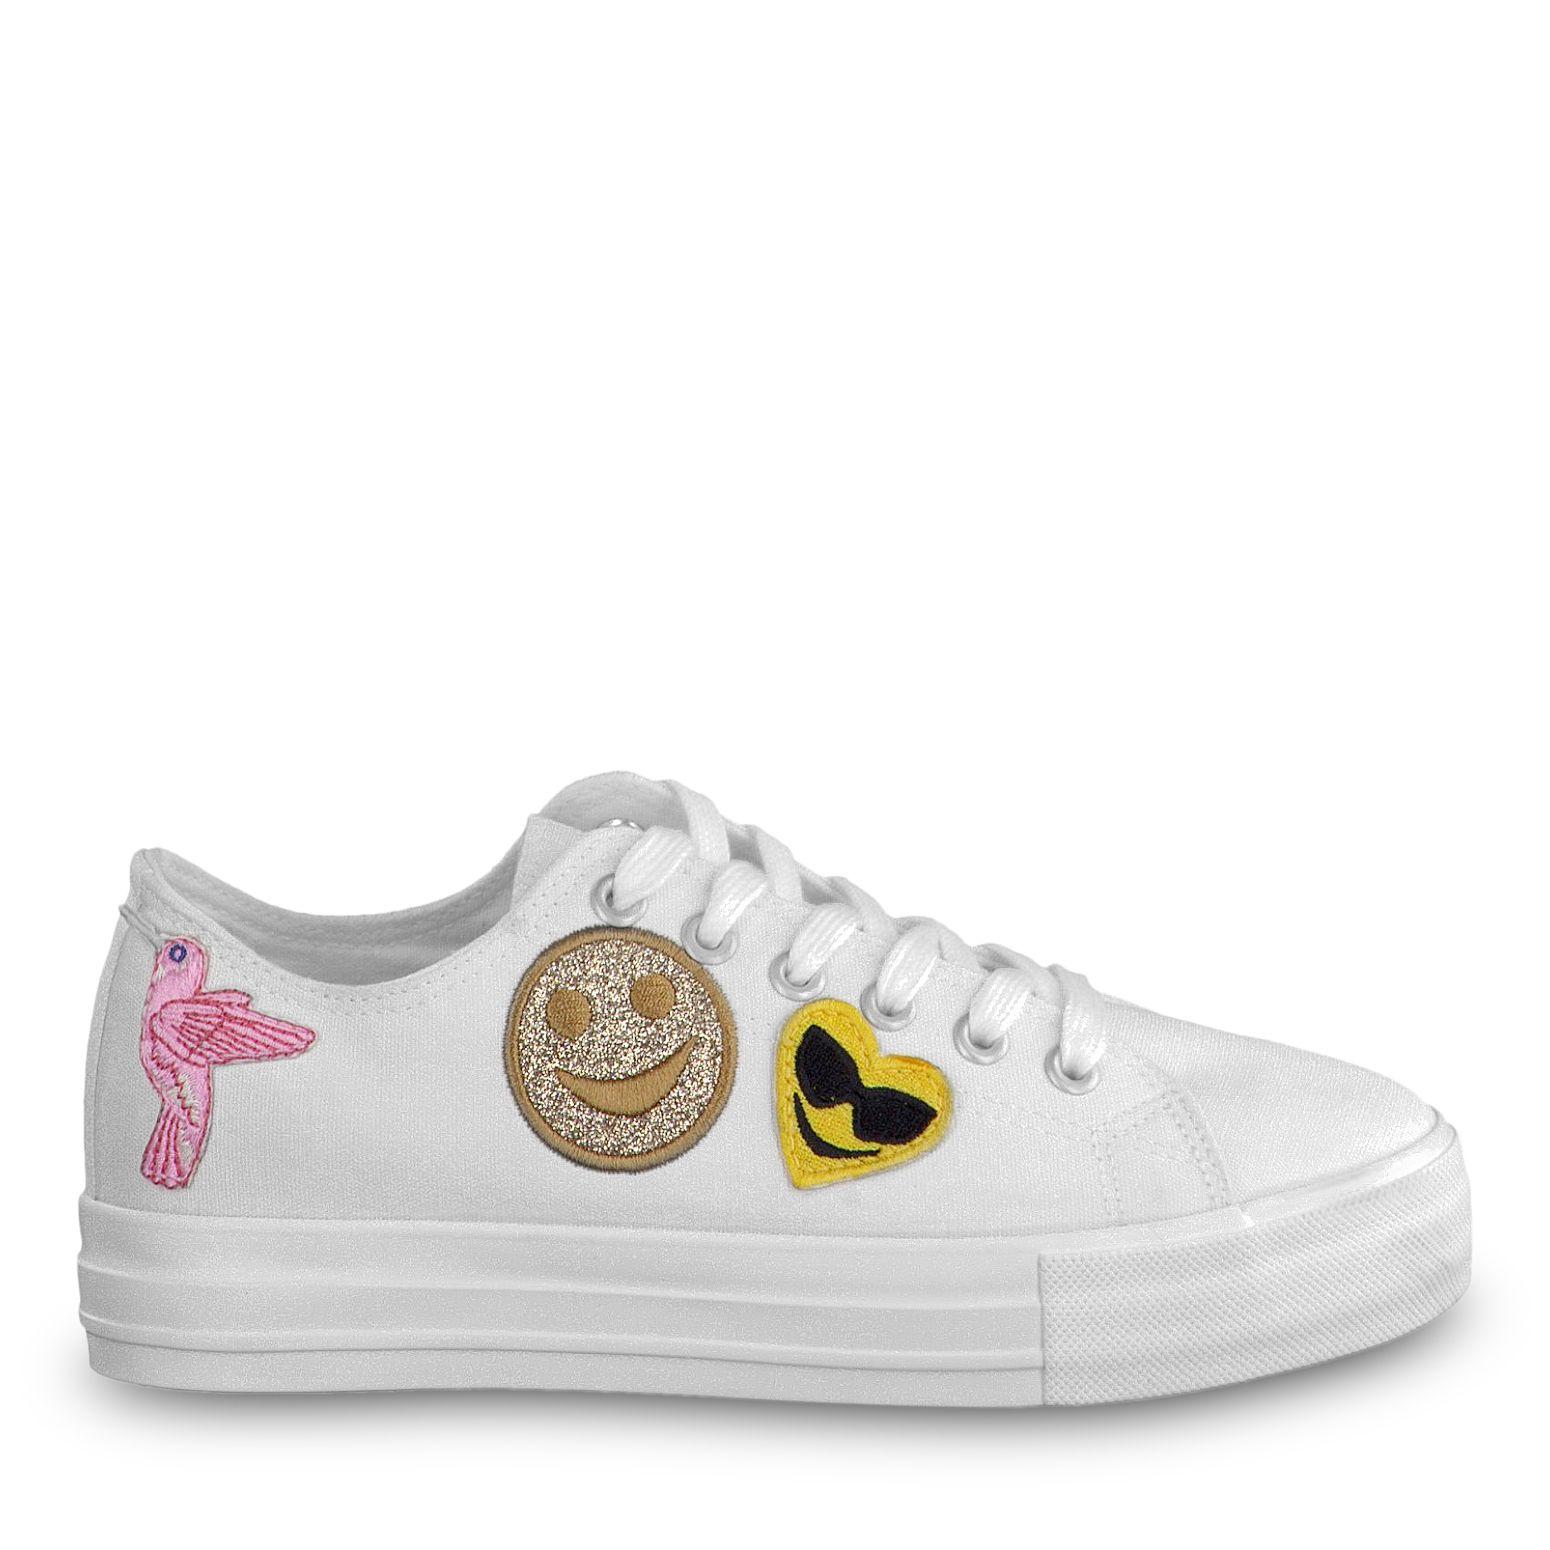 38967174cc2f38 Poloma 1-1-23633-28  Tamaris Sneaker online kaufen!